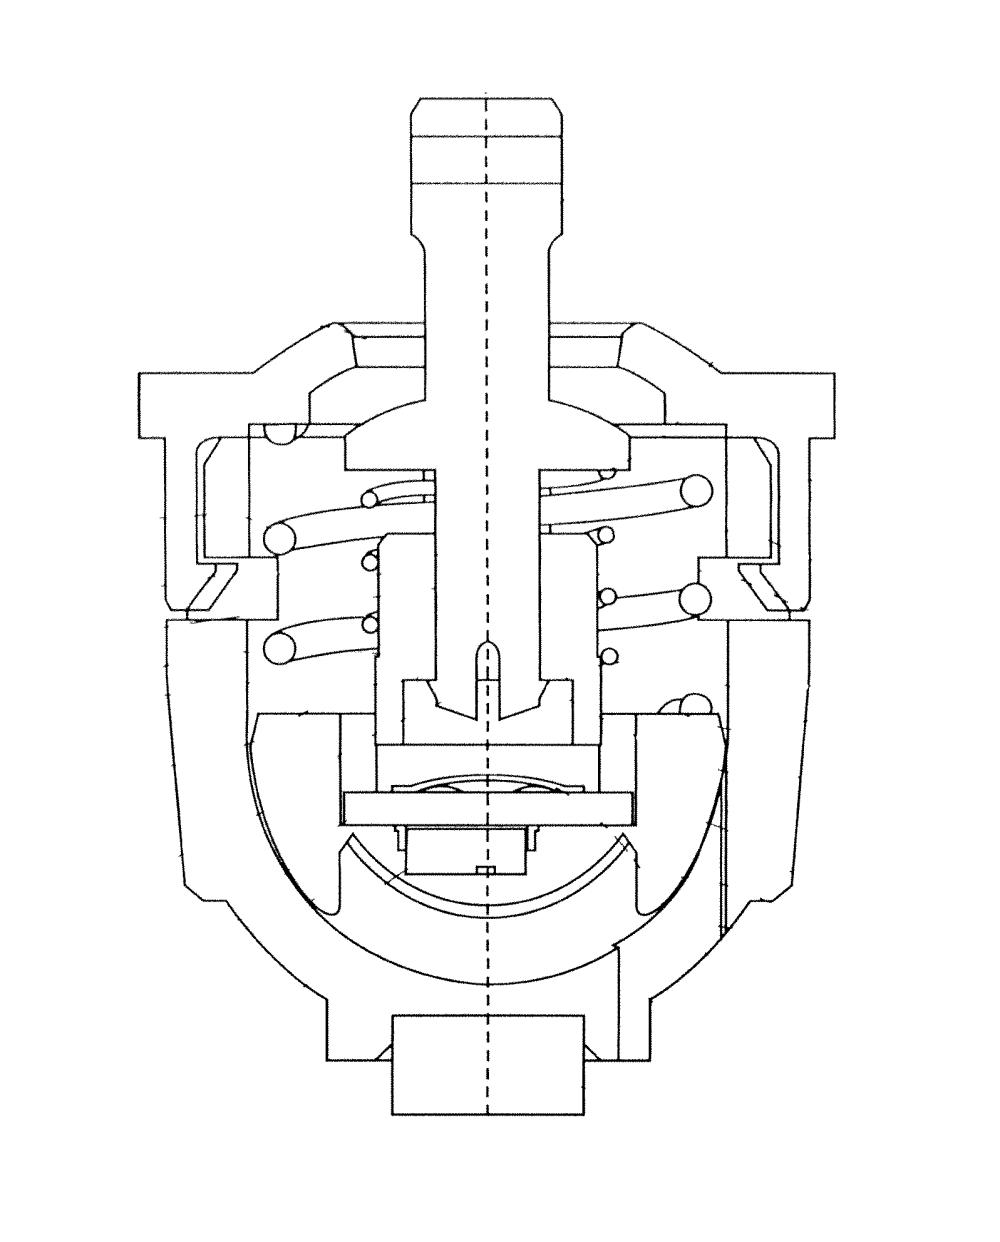 medium resolution of potentiometer joystick example